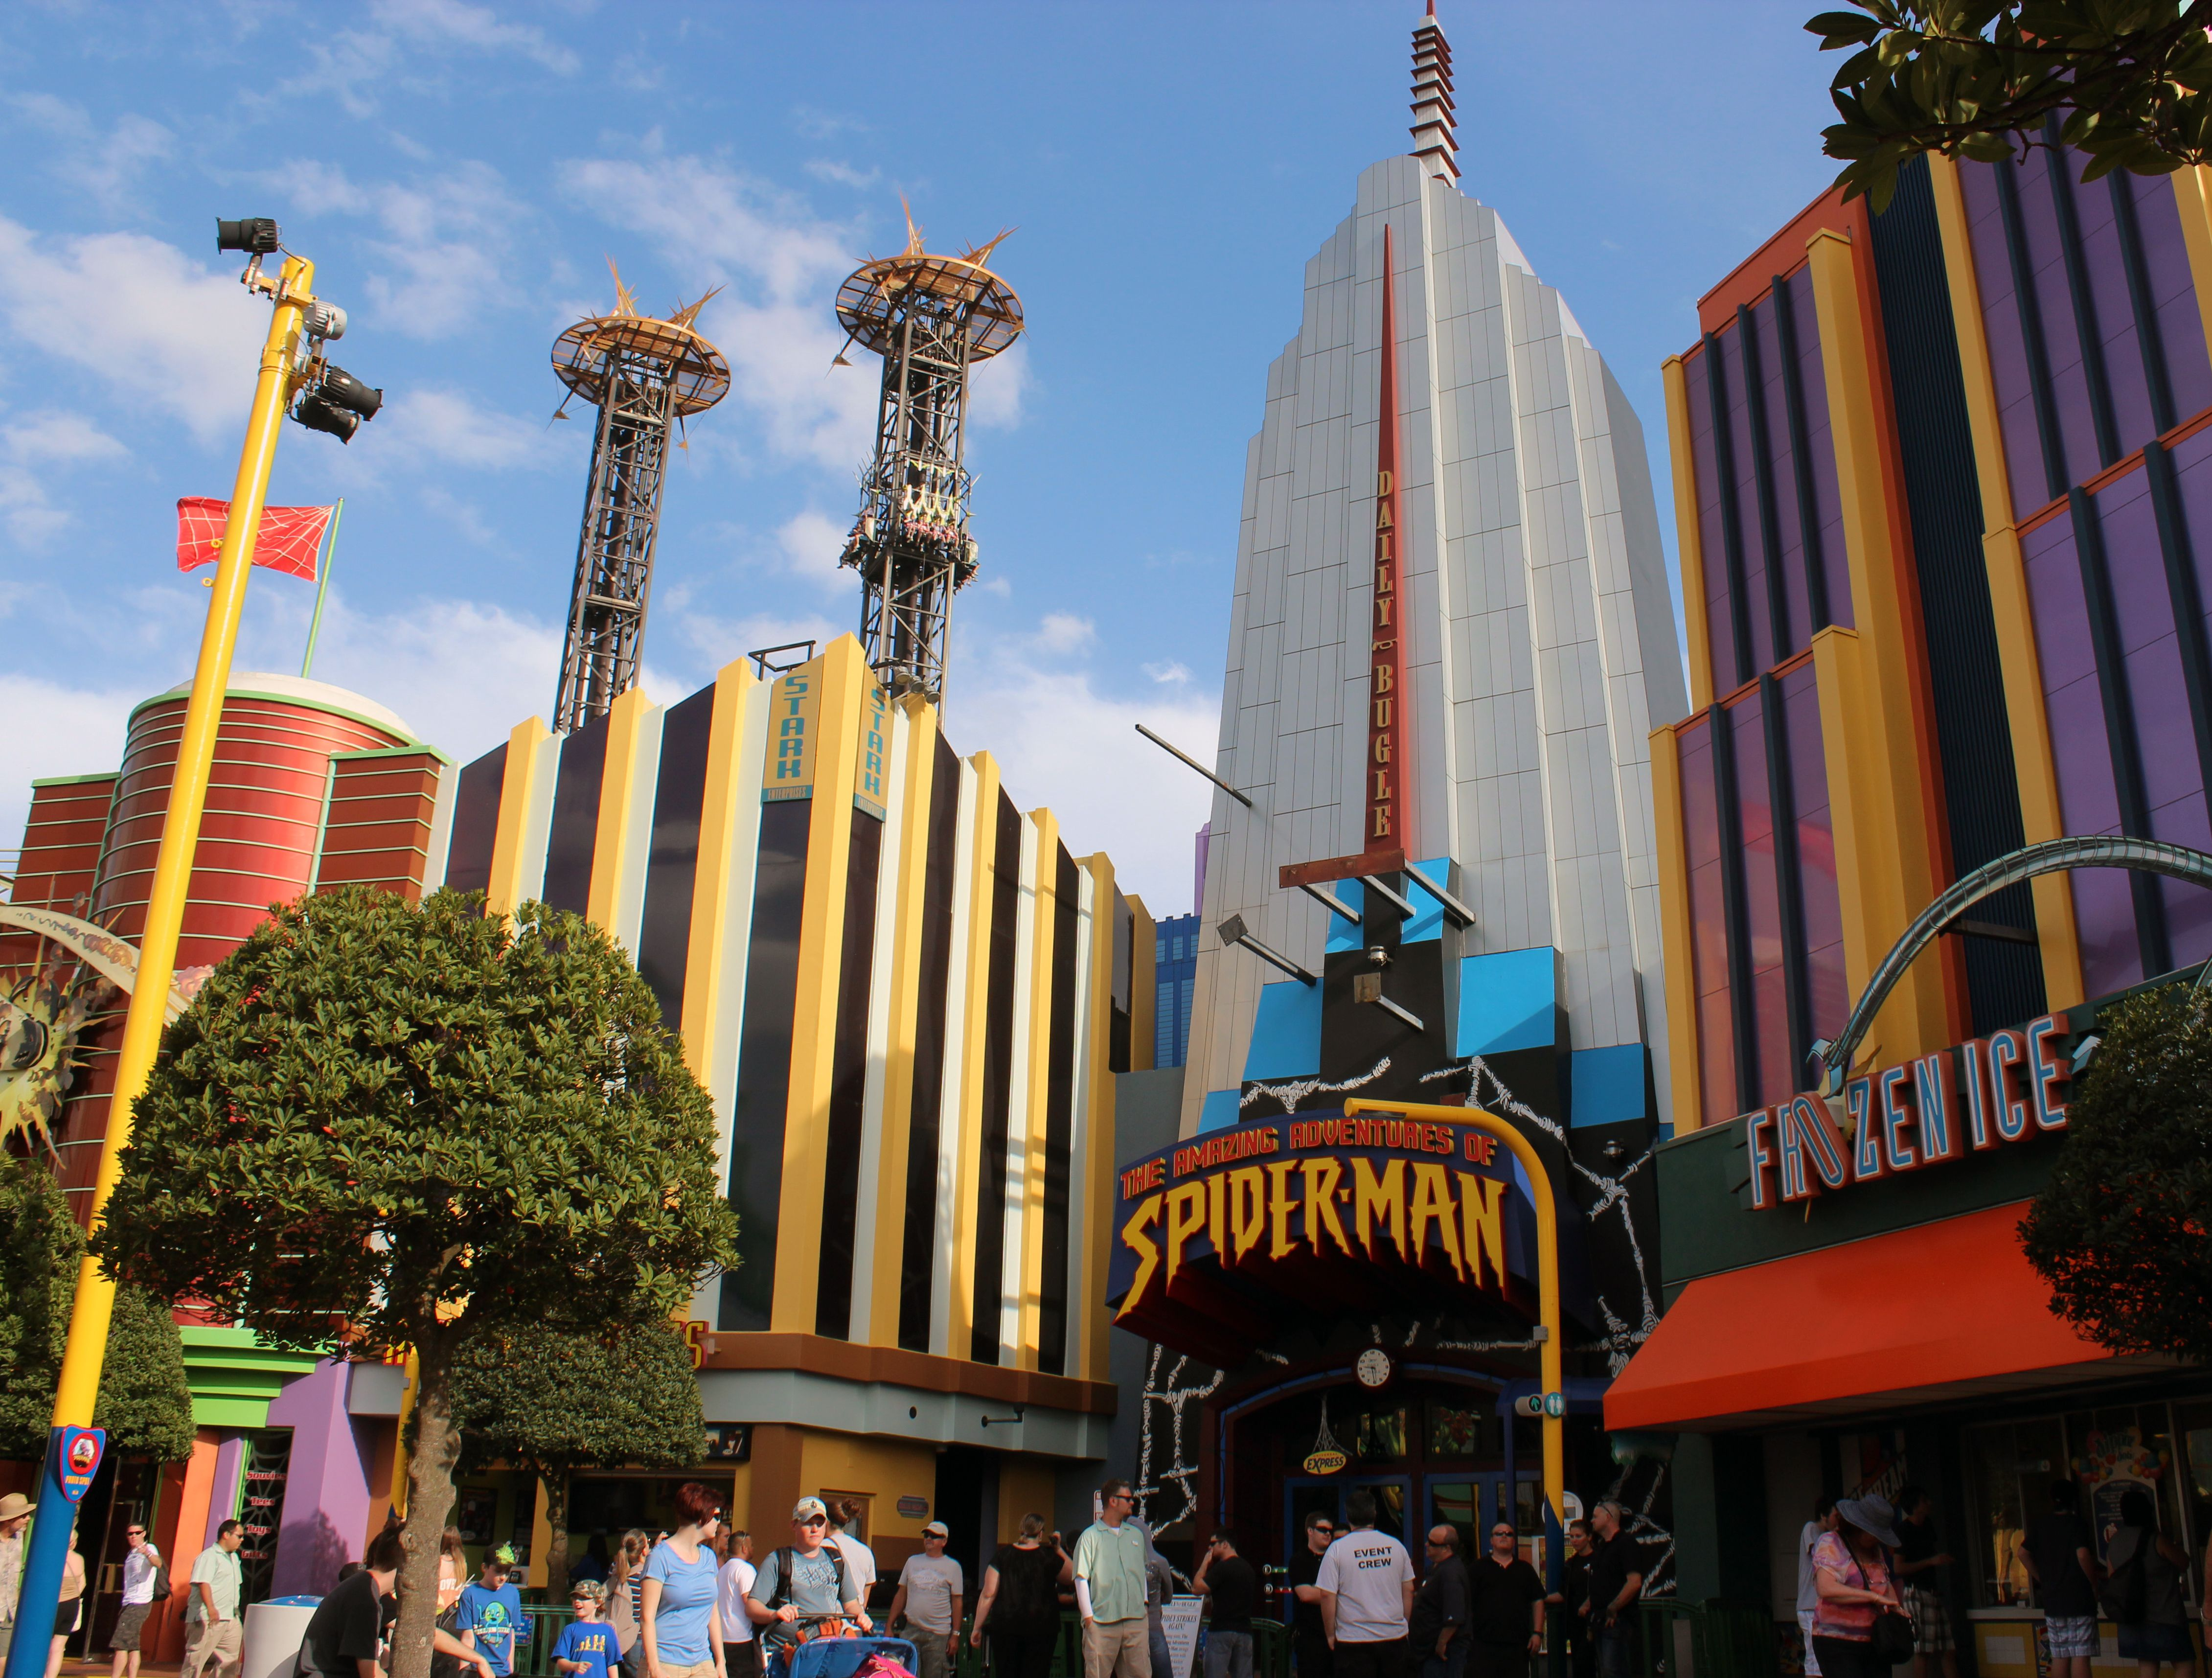 Spider-Man ride at Universal Orlando